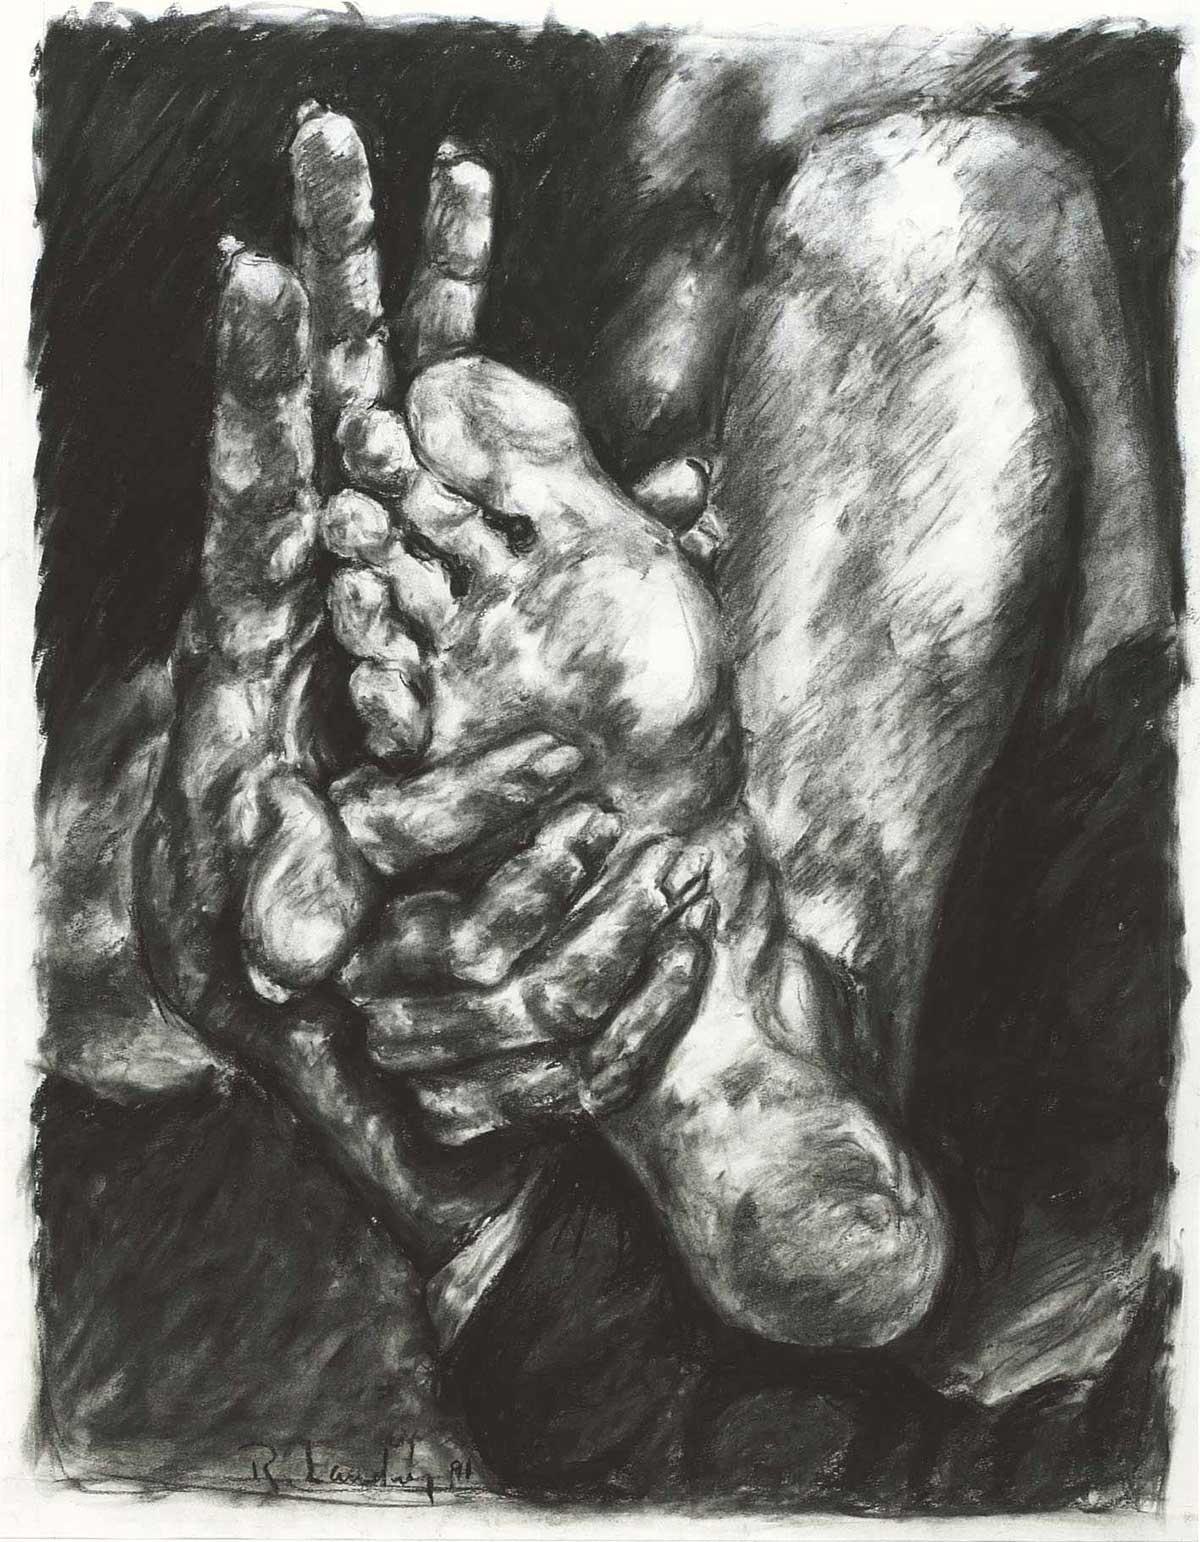 IMPROVISATION OF HANDS AND FEET